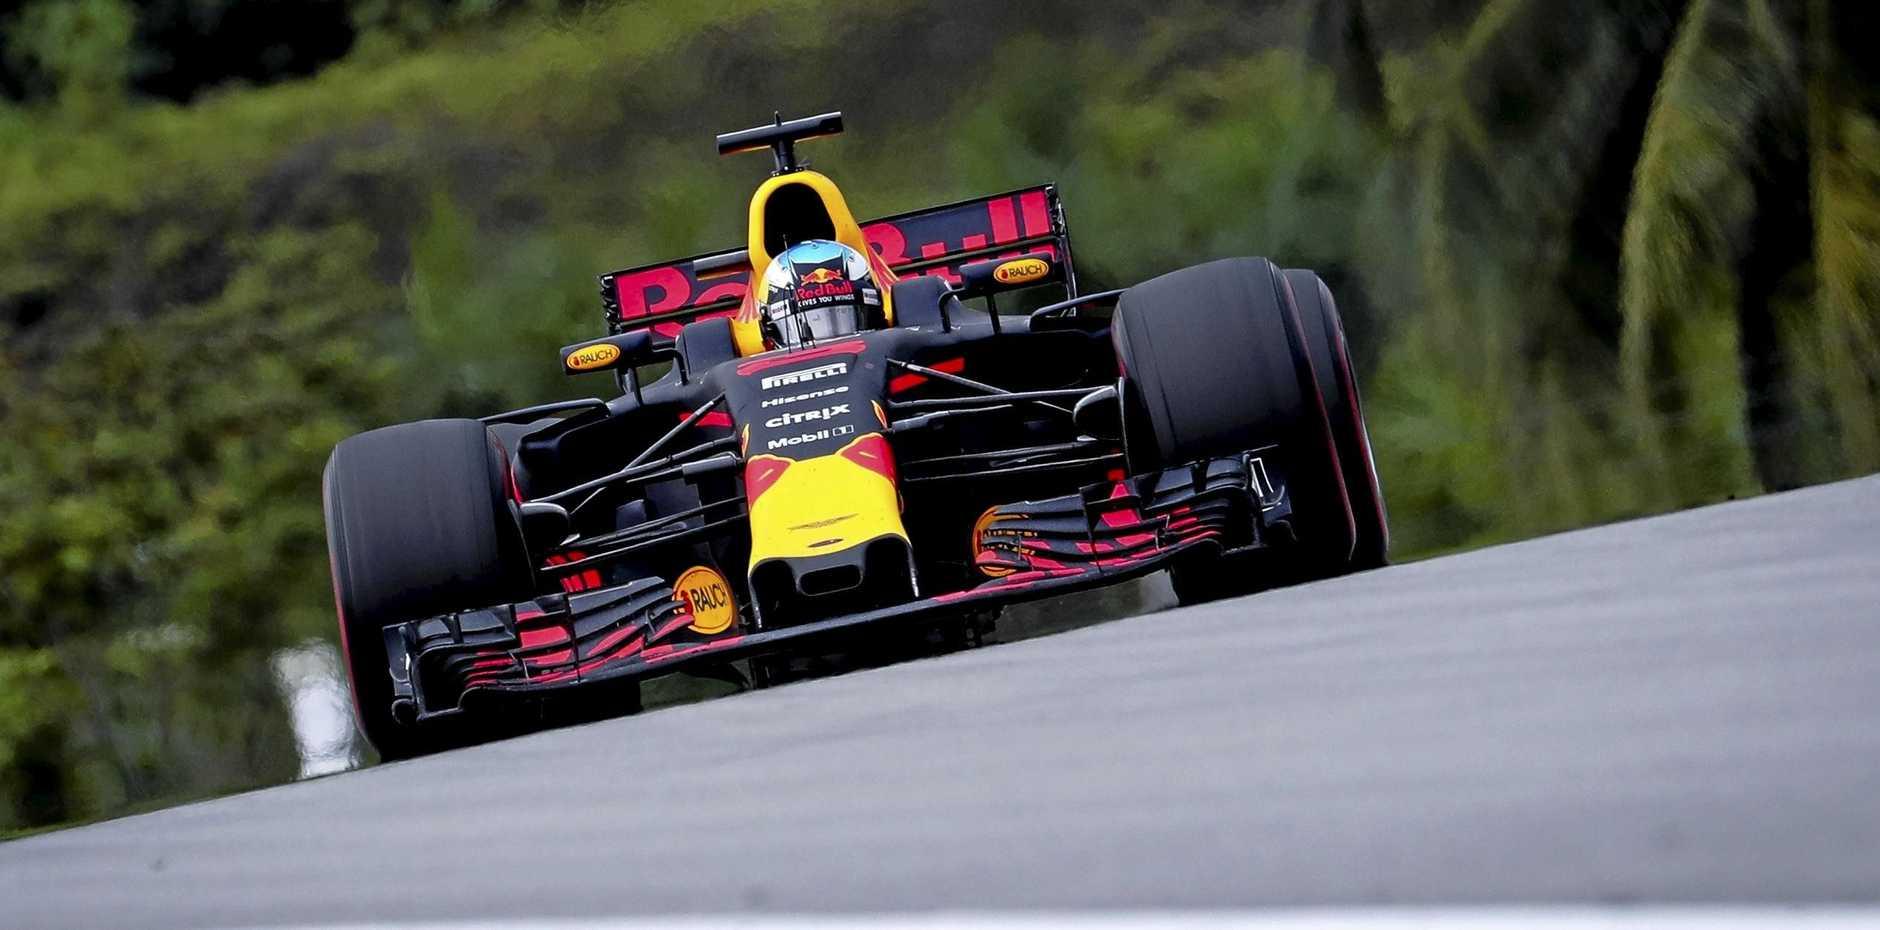 Australian Formula One driver Daniel Ricciardo guides the Red Bull Racing car around the Malaysian circuit.